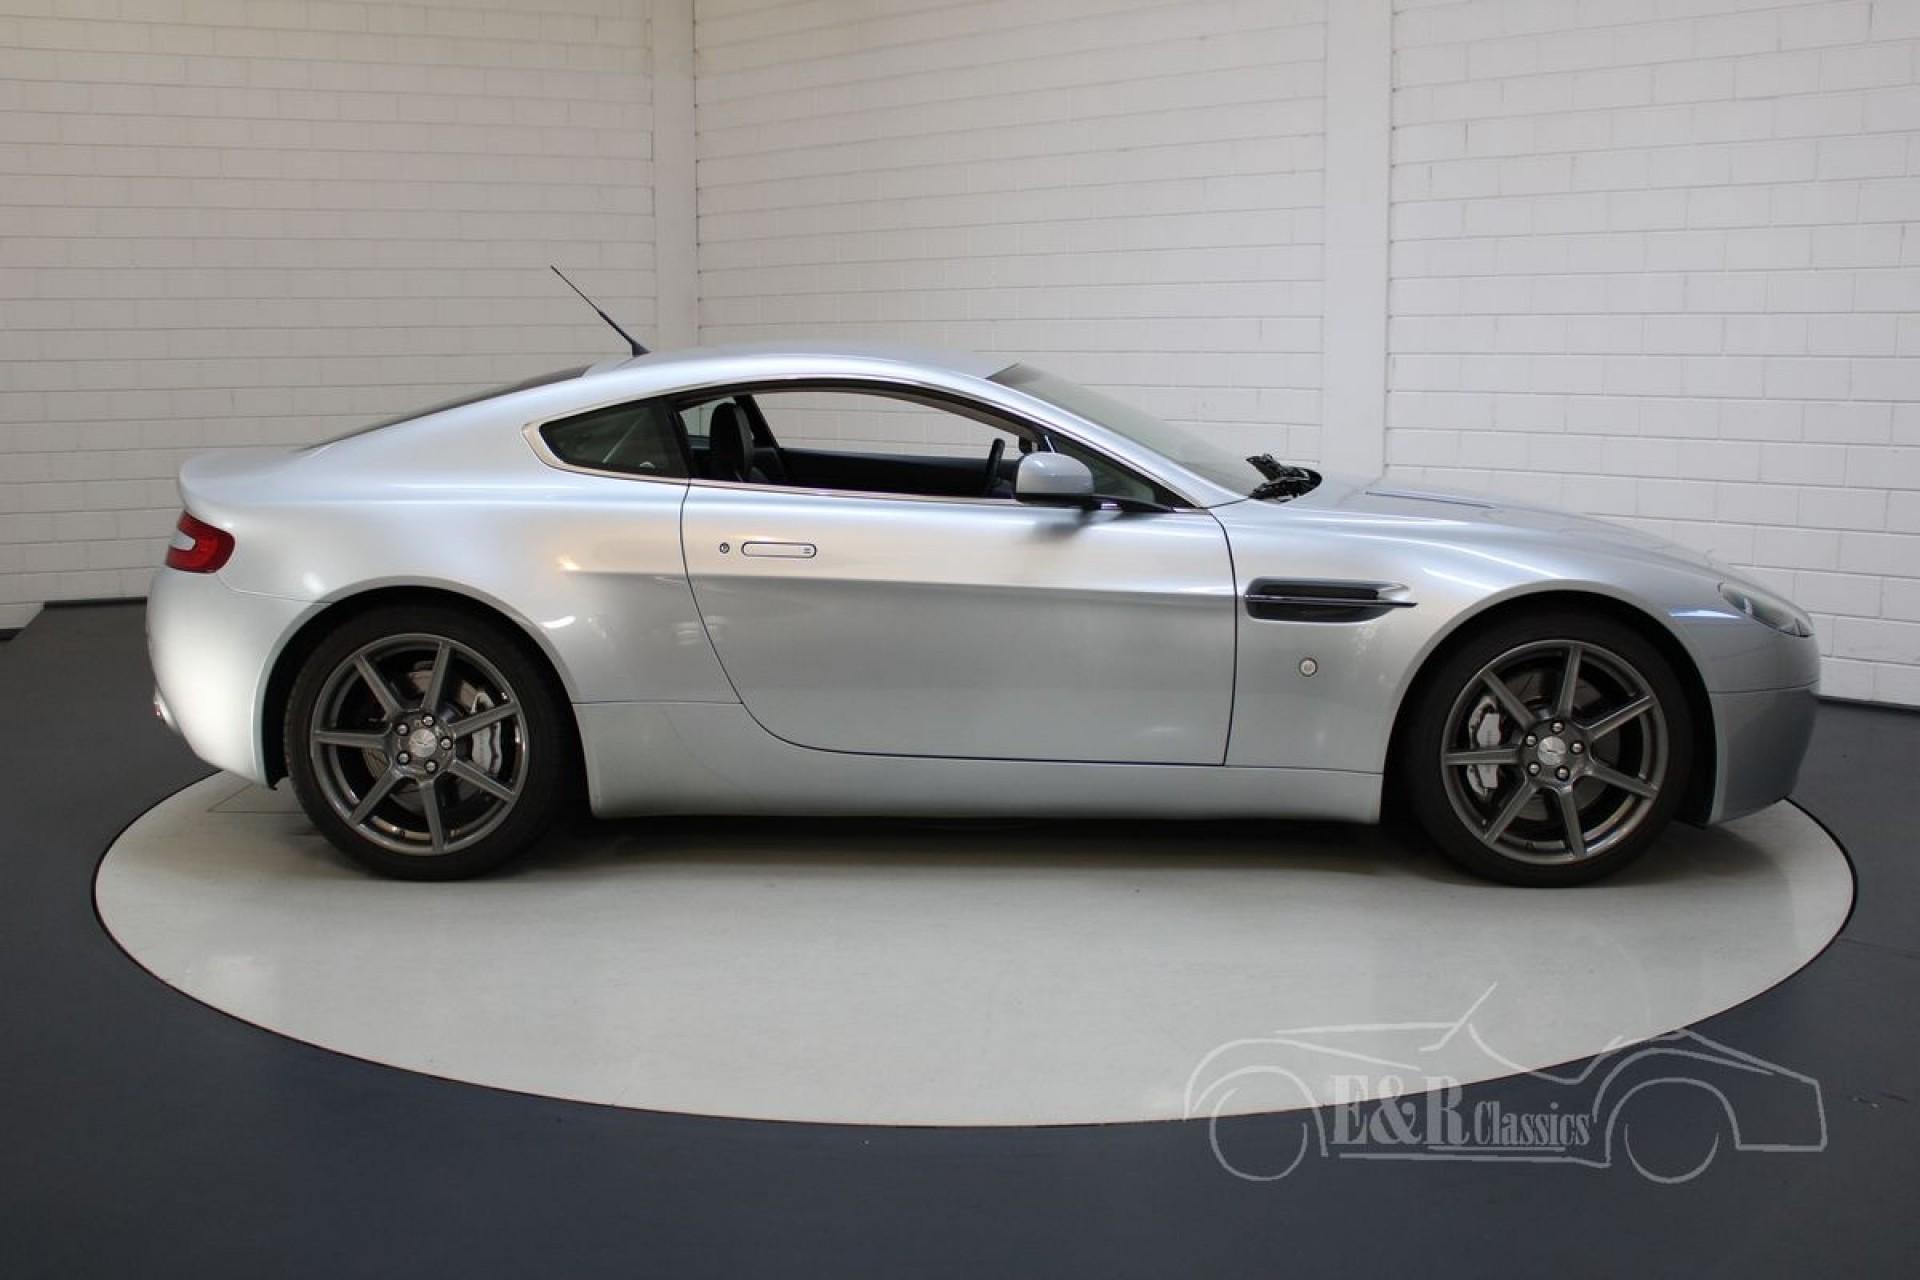 Aston Martin V8 Vantage For Sale At Erclassics